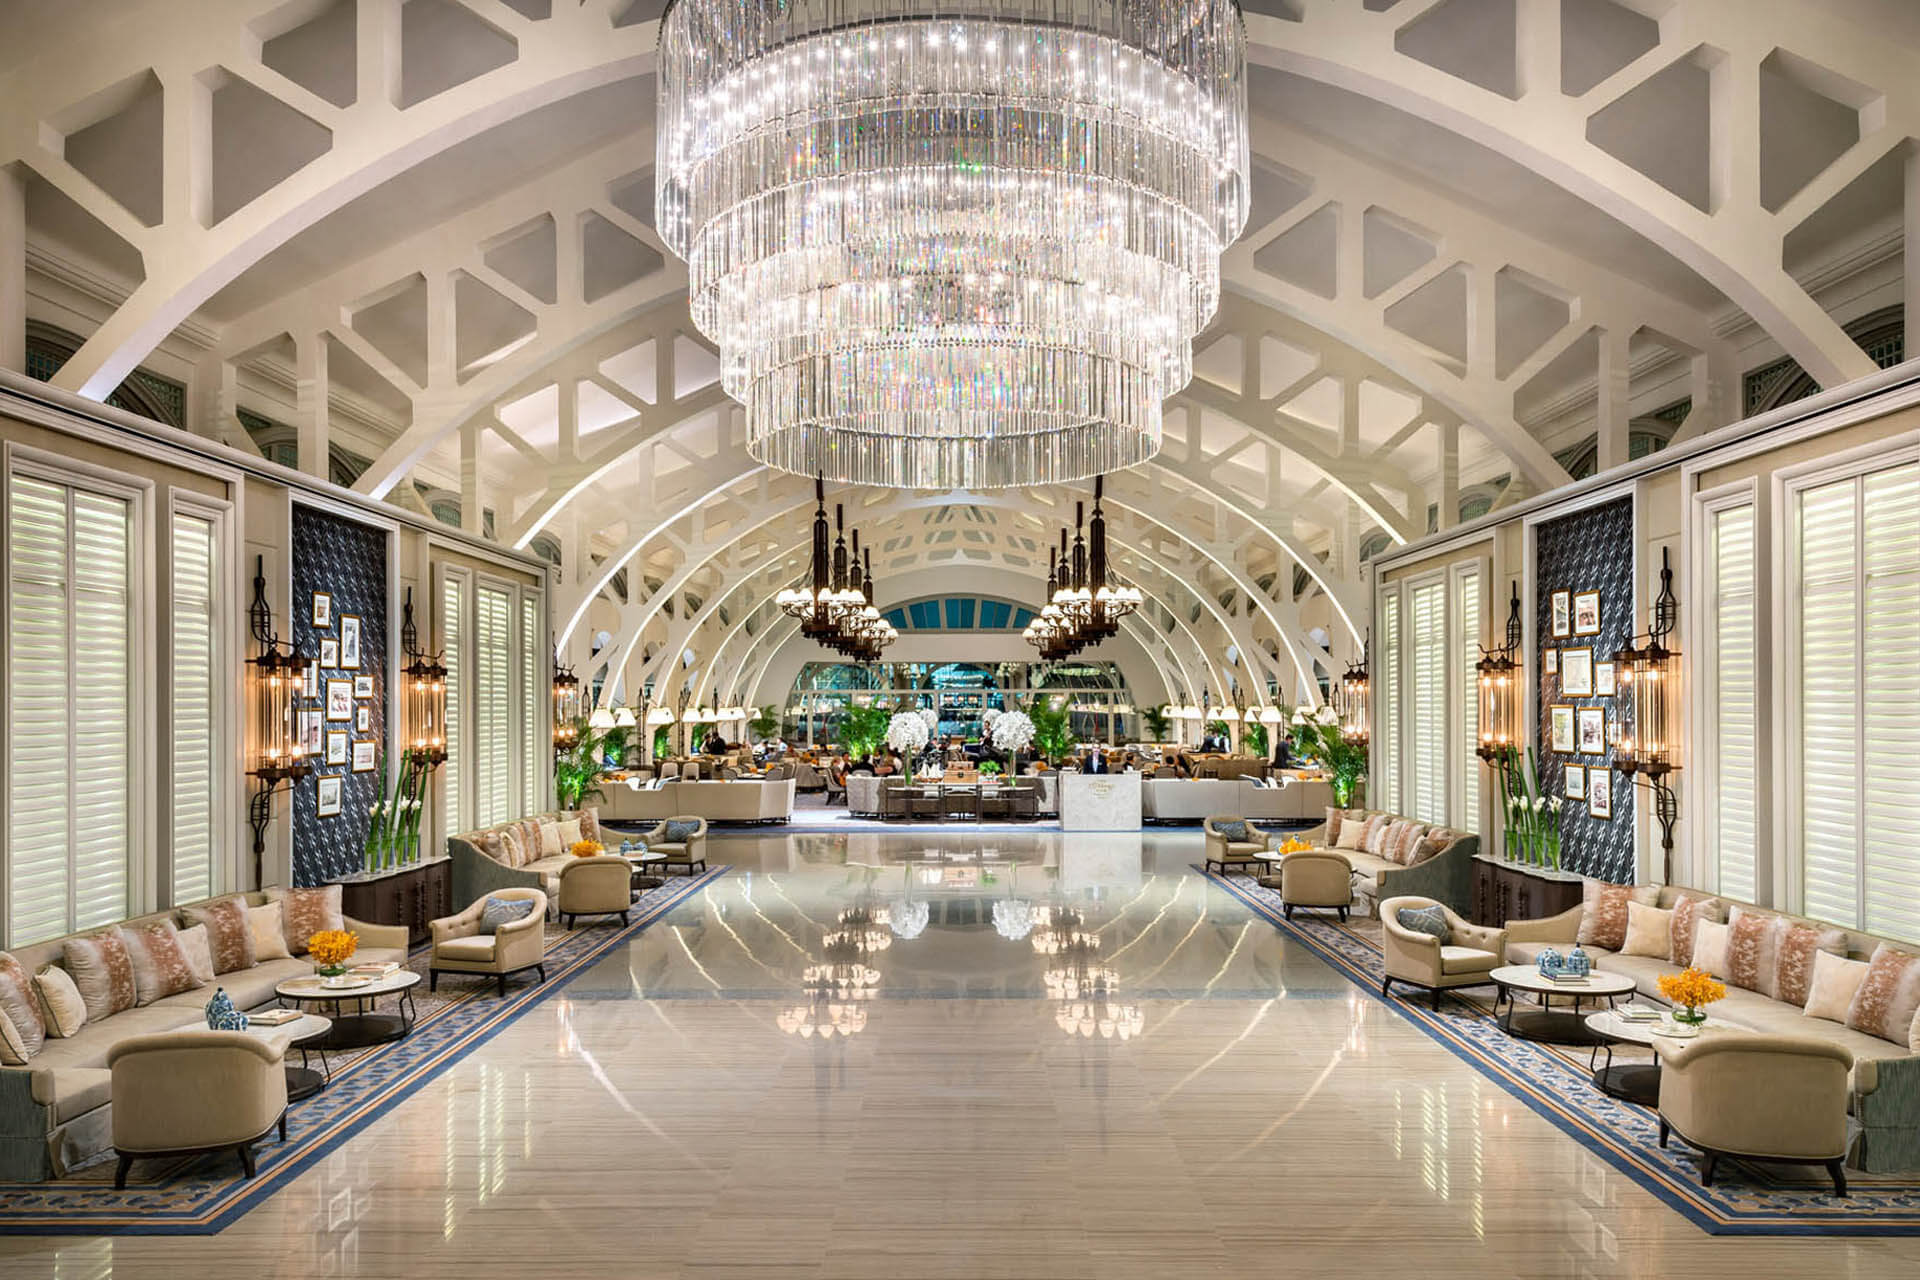 A huge chandelier in the lobby of Fullertone bay hotel